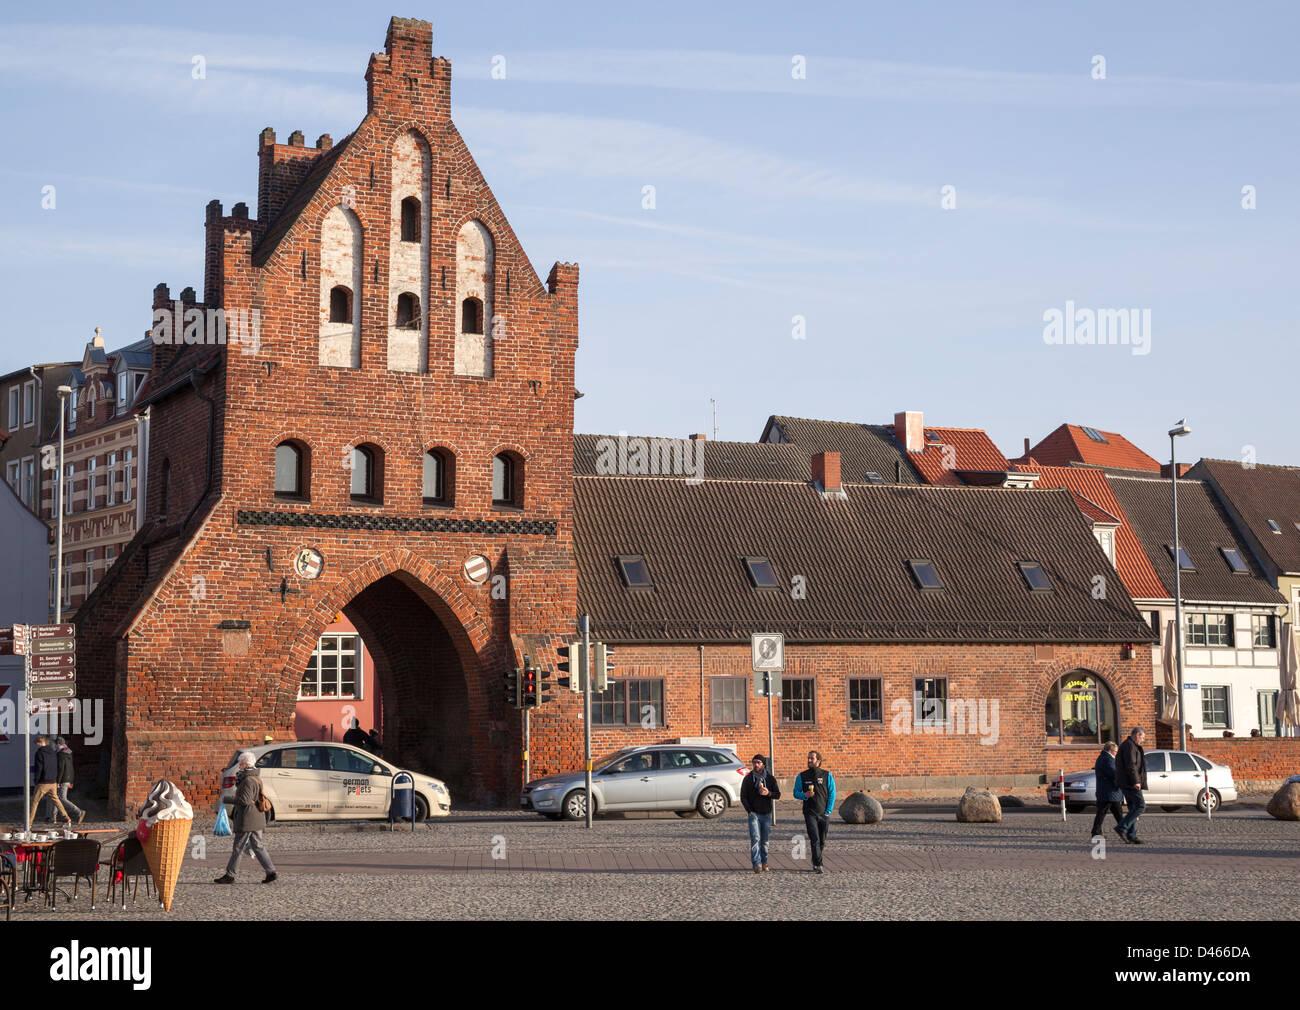 Wassertor, Wismar, Mecklenburg Vorpommern, Germany - Stock Image